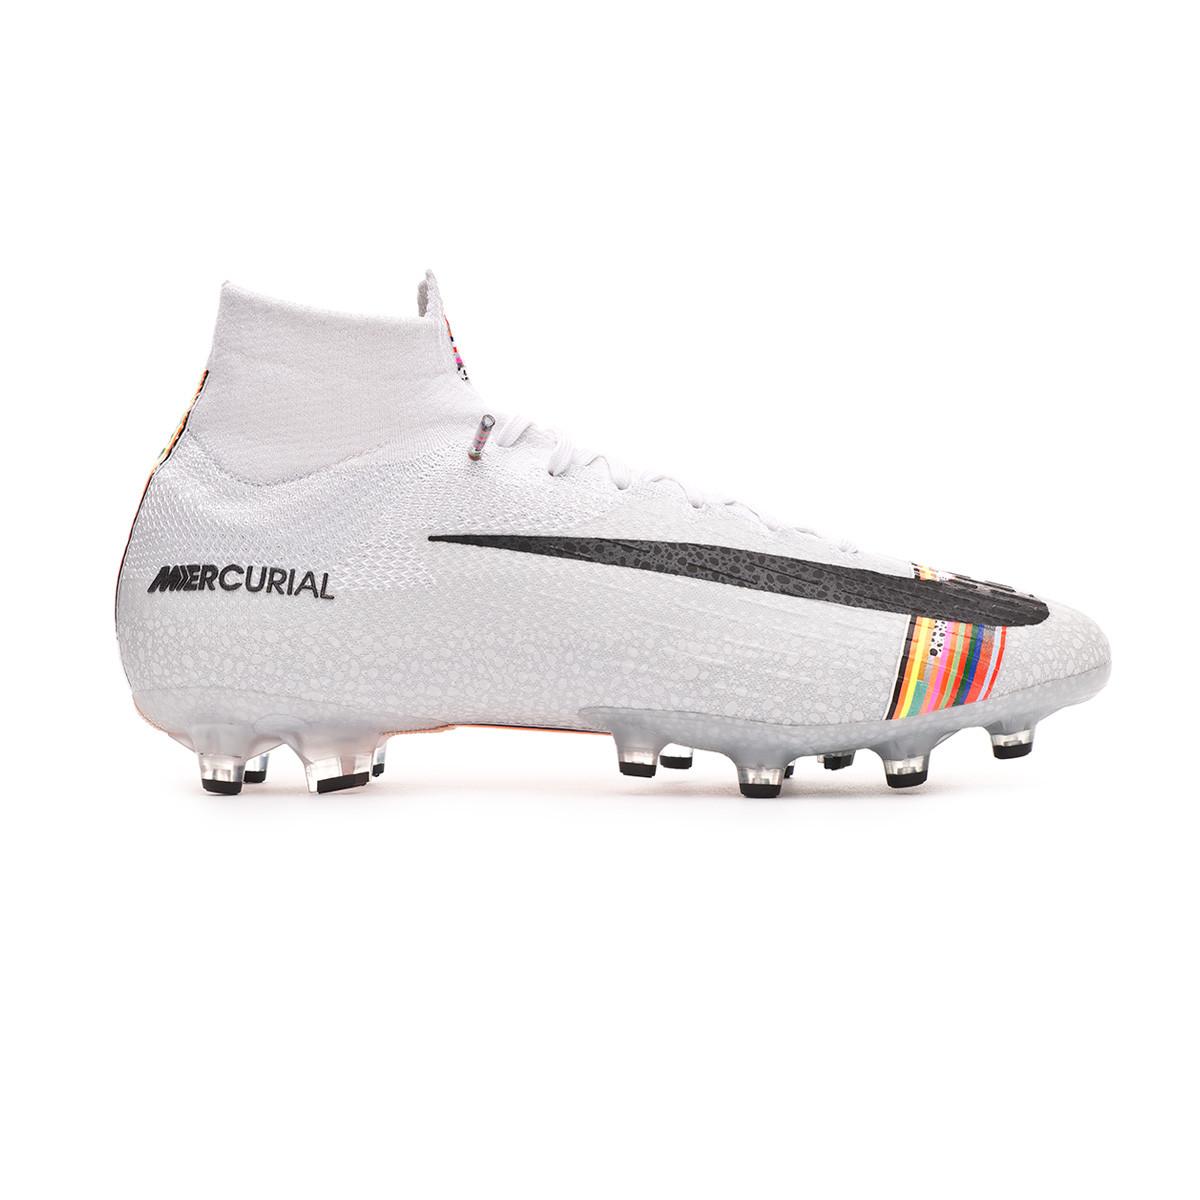 afd2336ff3e88 Zapatos de fútbol Nike Mercurial Superfly VI Elite LVL UP AG-Pro  White-Black-Pure platinum - Tienda de fútbol Fútbol Emotion